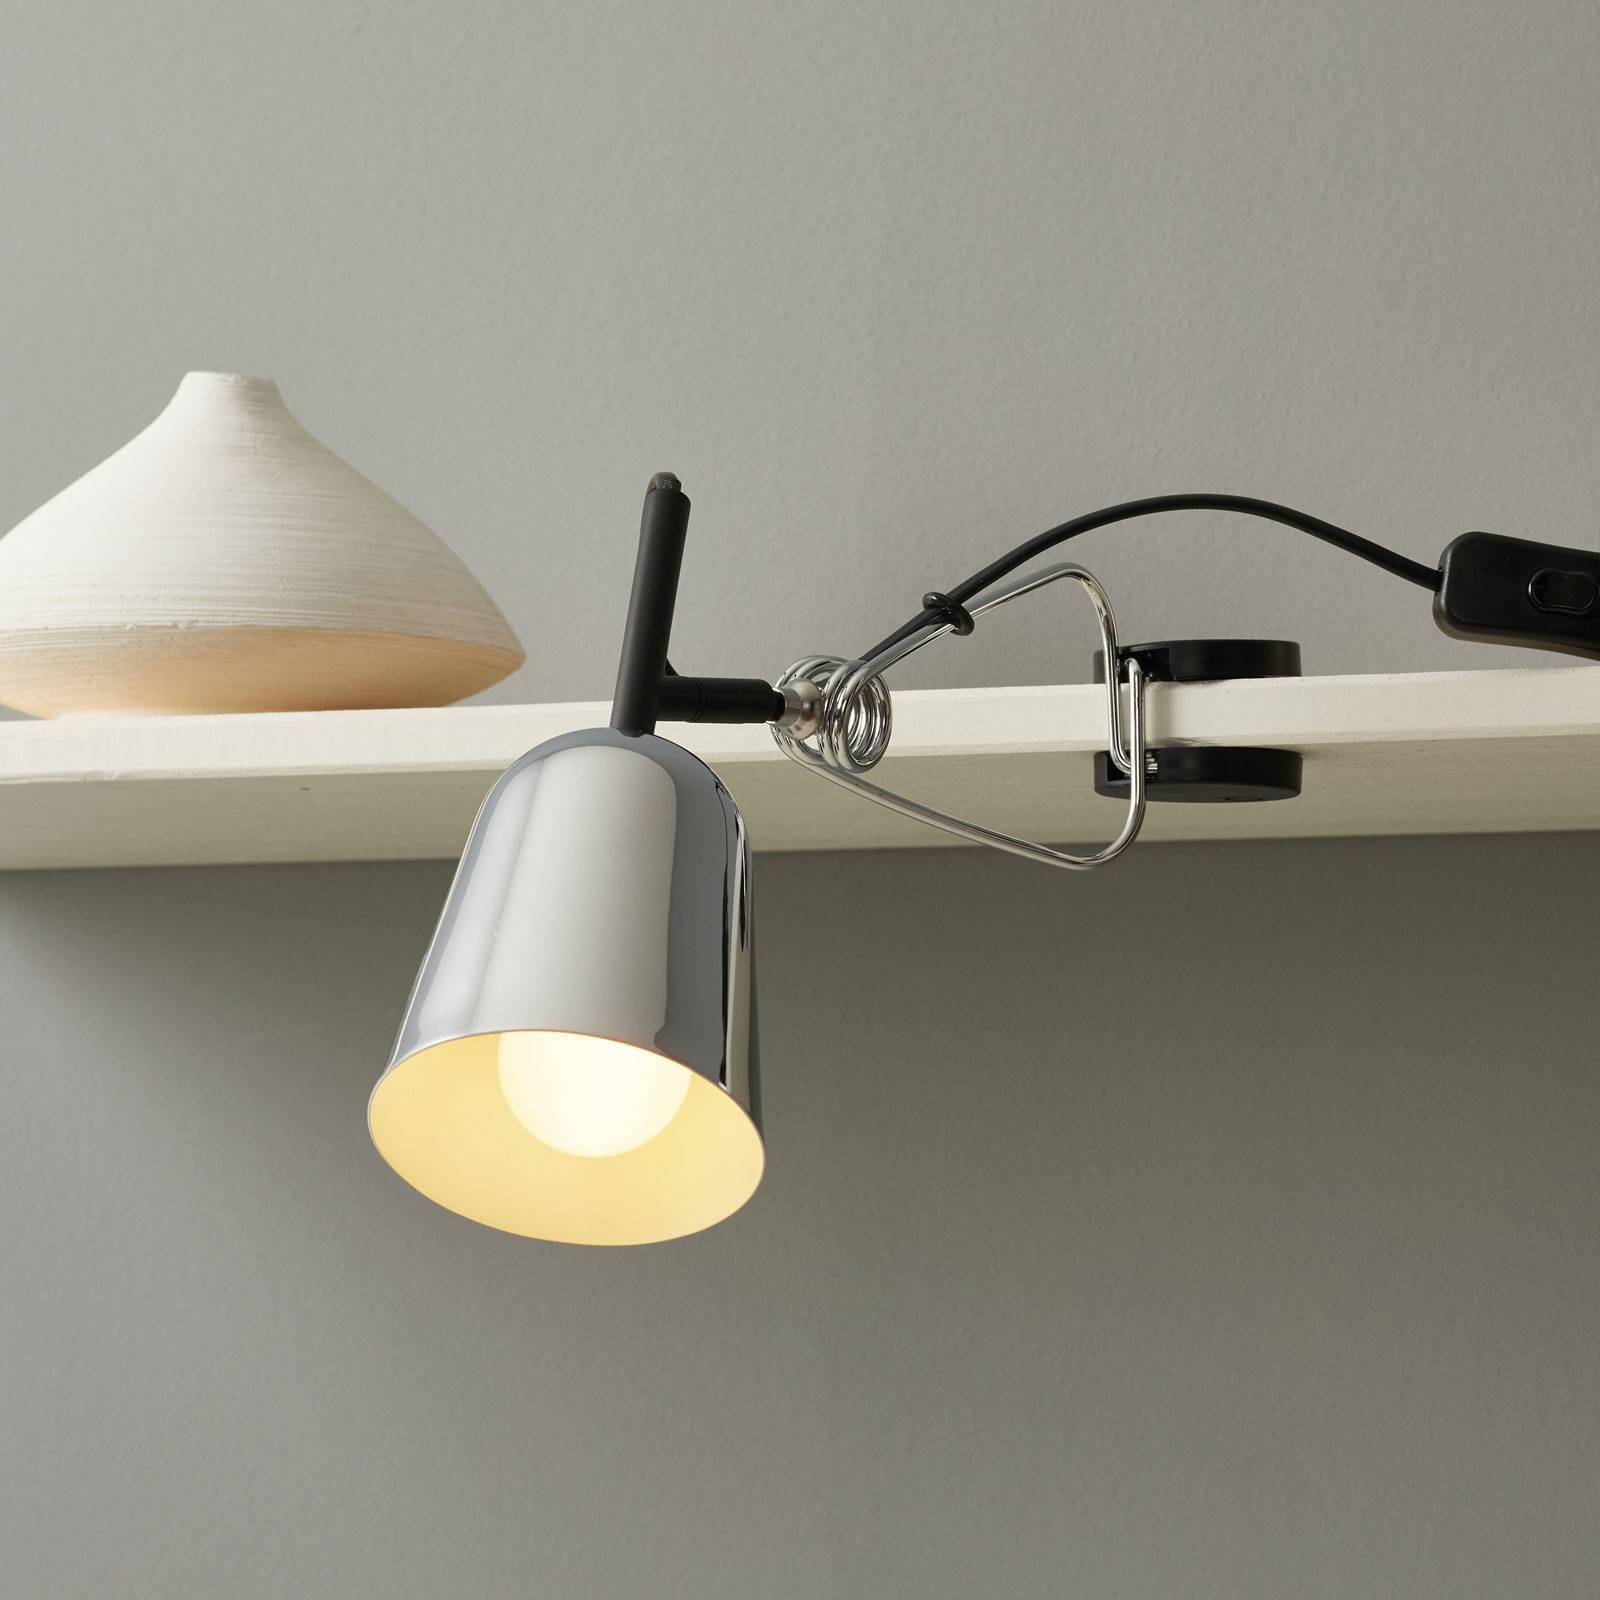 Klemlamp studio, verchroomd